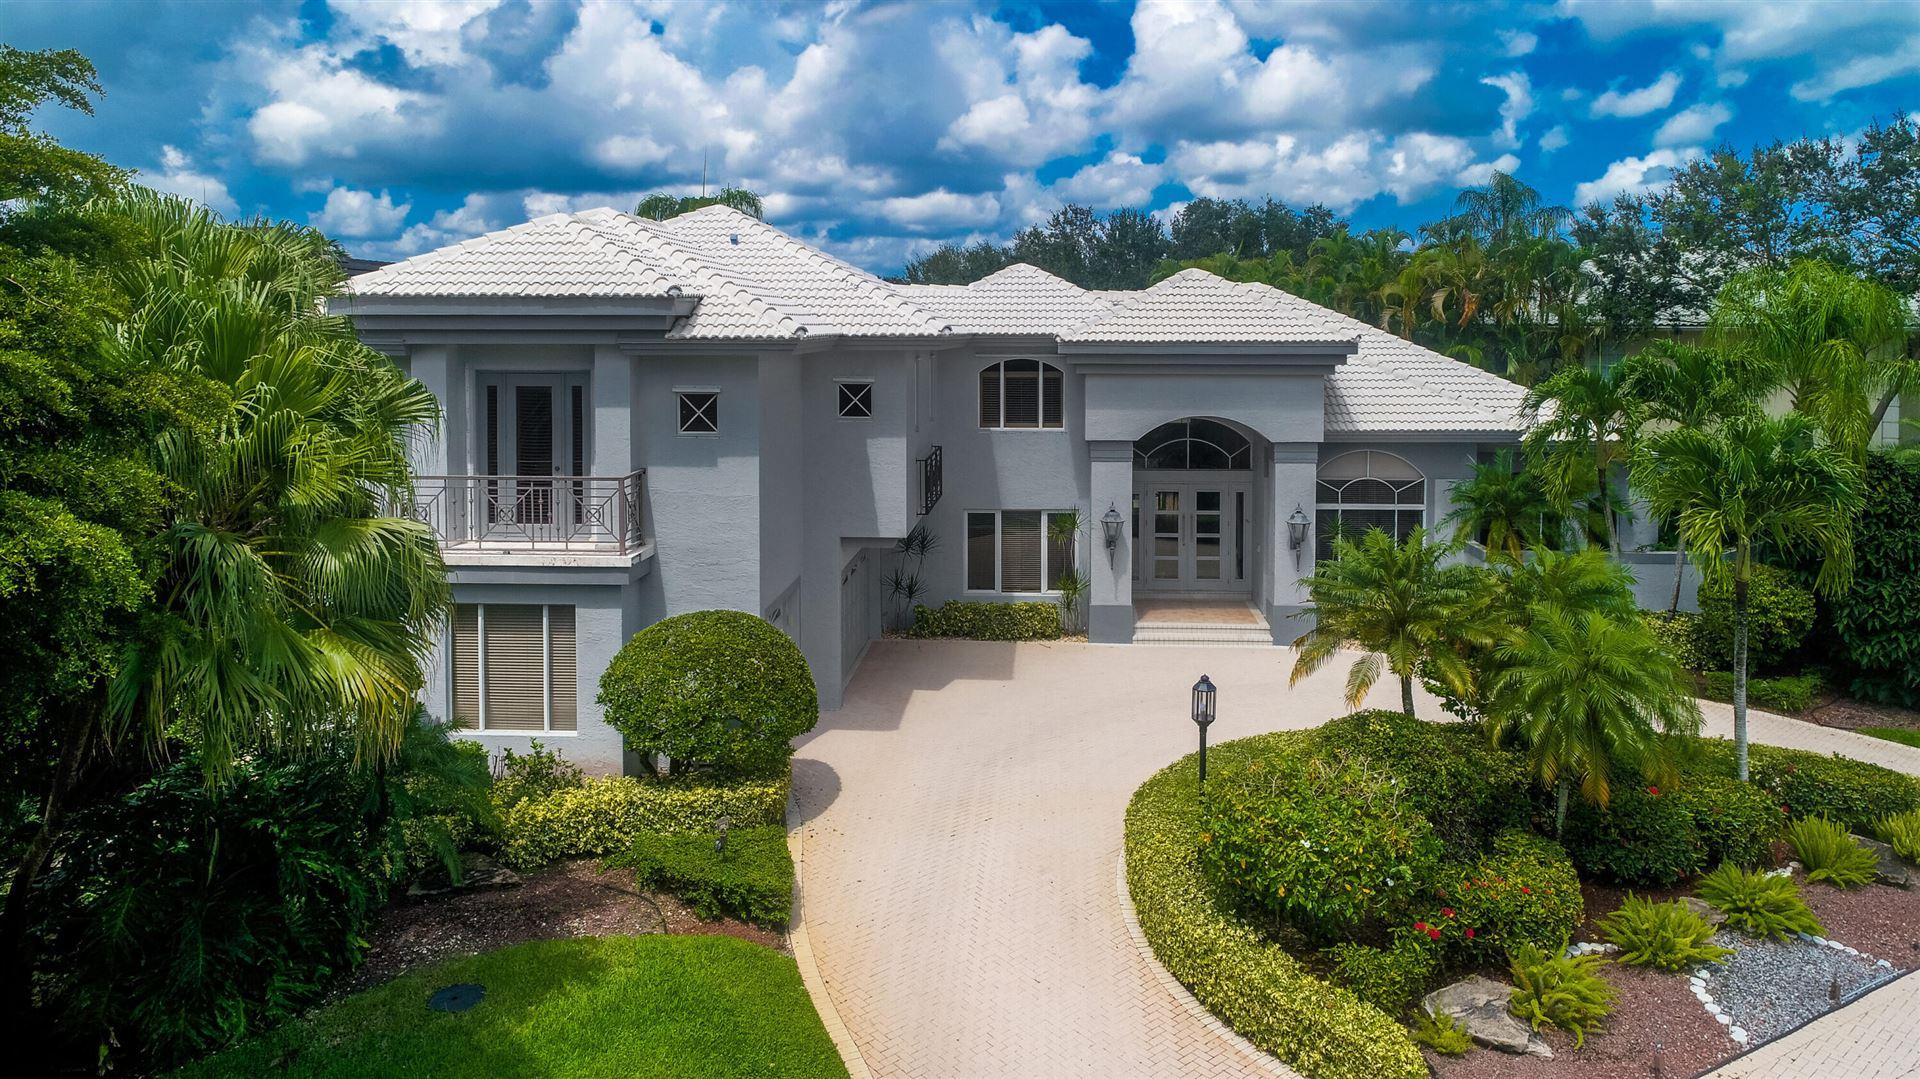 21385 Greenwood Court, Boca Raton, FL 33433 - MLS#: RX-10743018